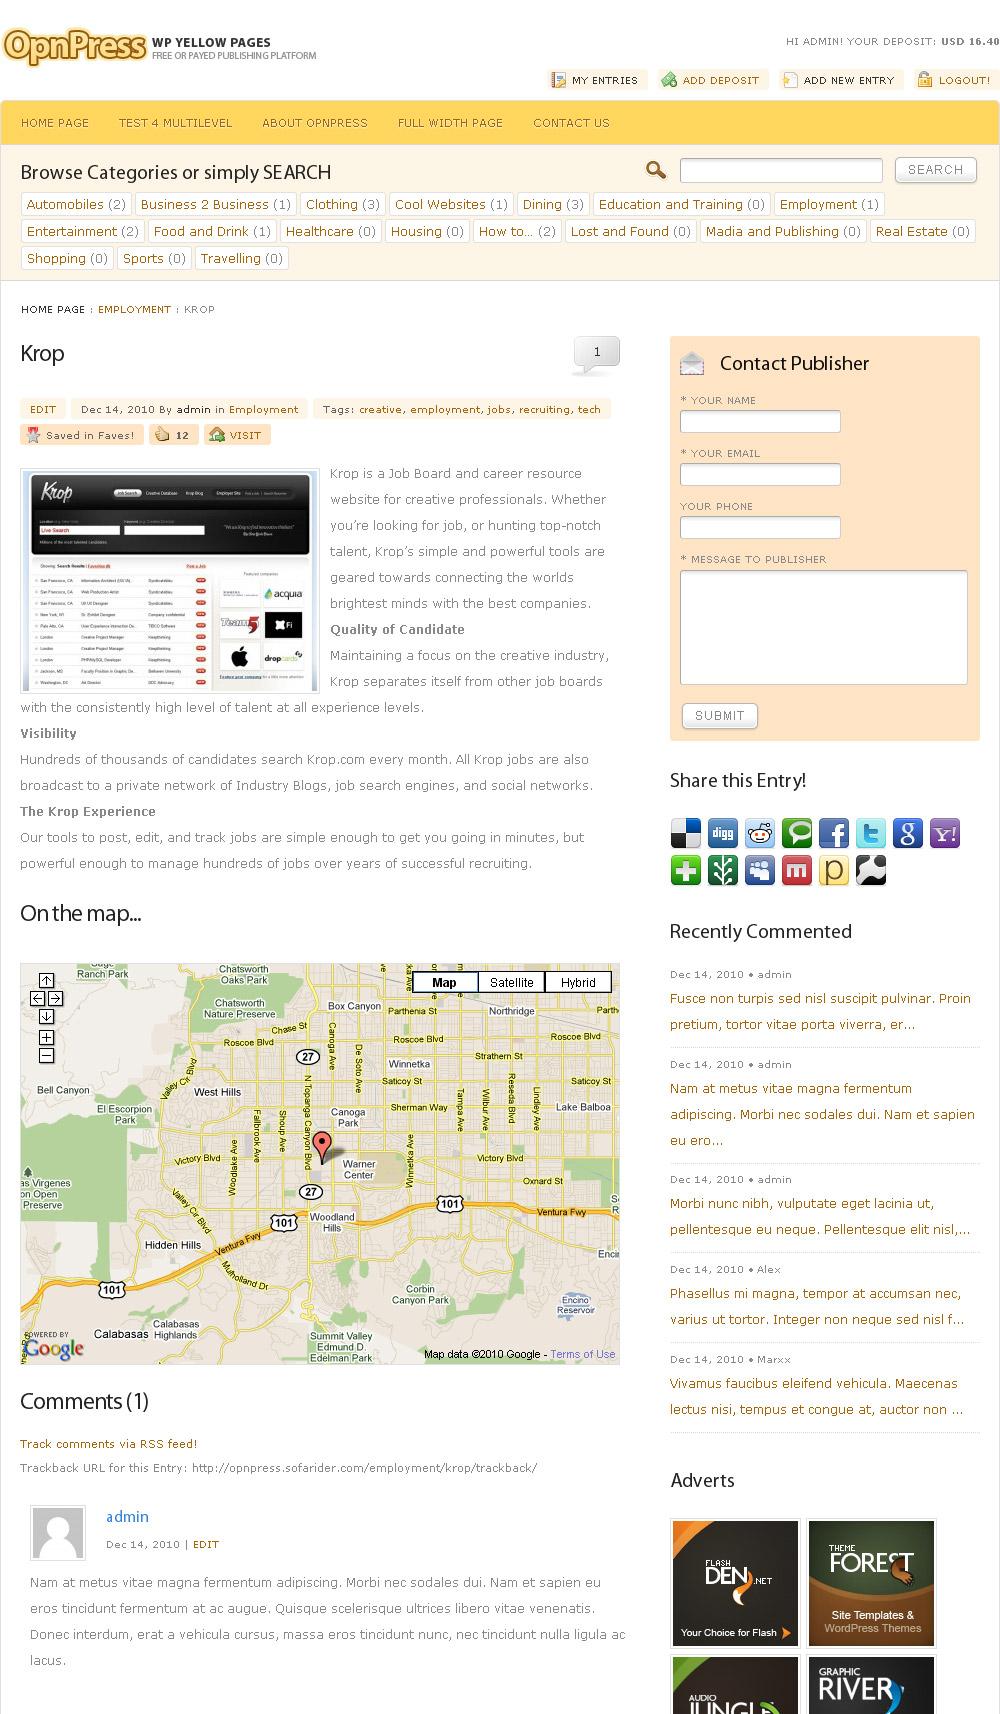 Sofa OpnPress - Publishing Platform - Entry details view.